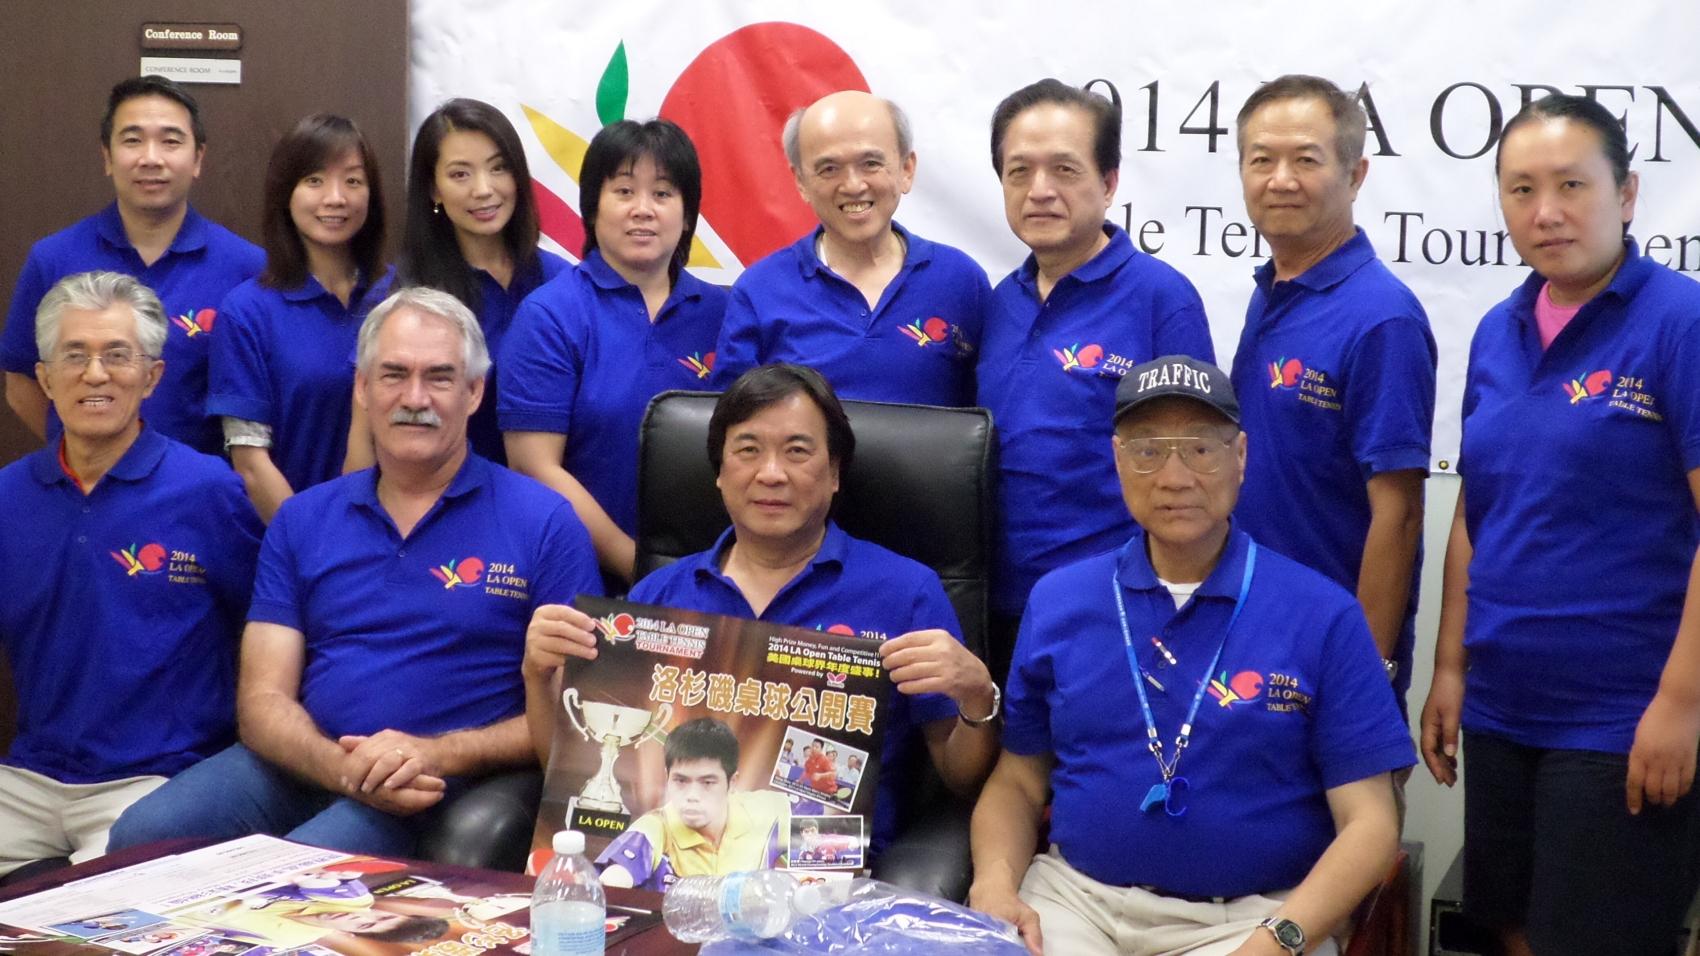 2014_LA_Open_Committee